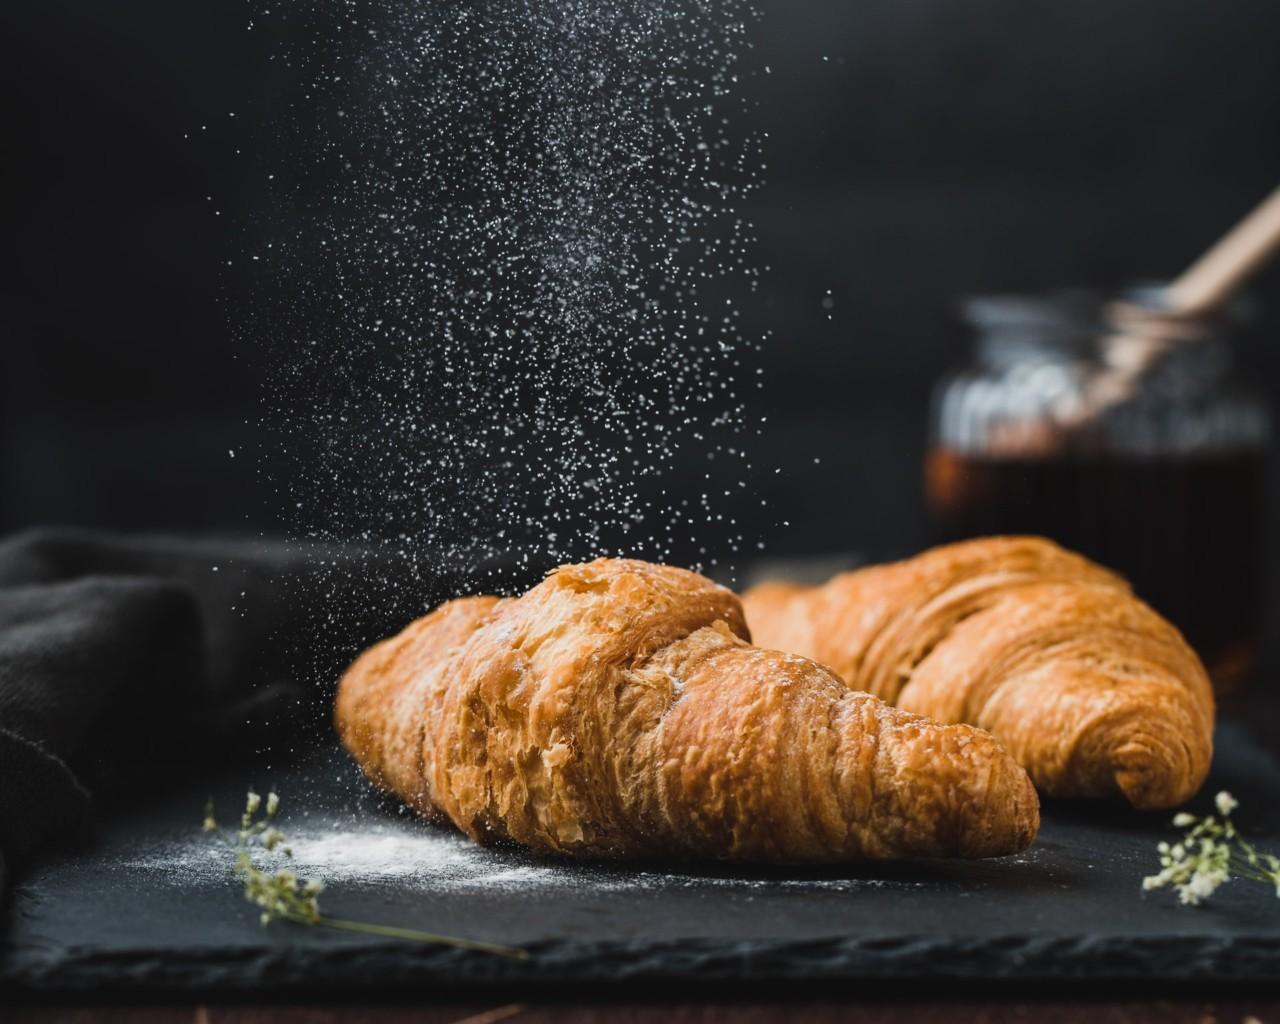 croissant-mel-gluten-mae-mu-unsplash-greenhouse